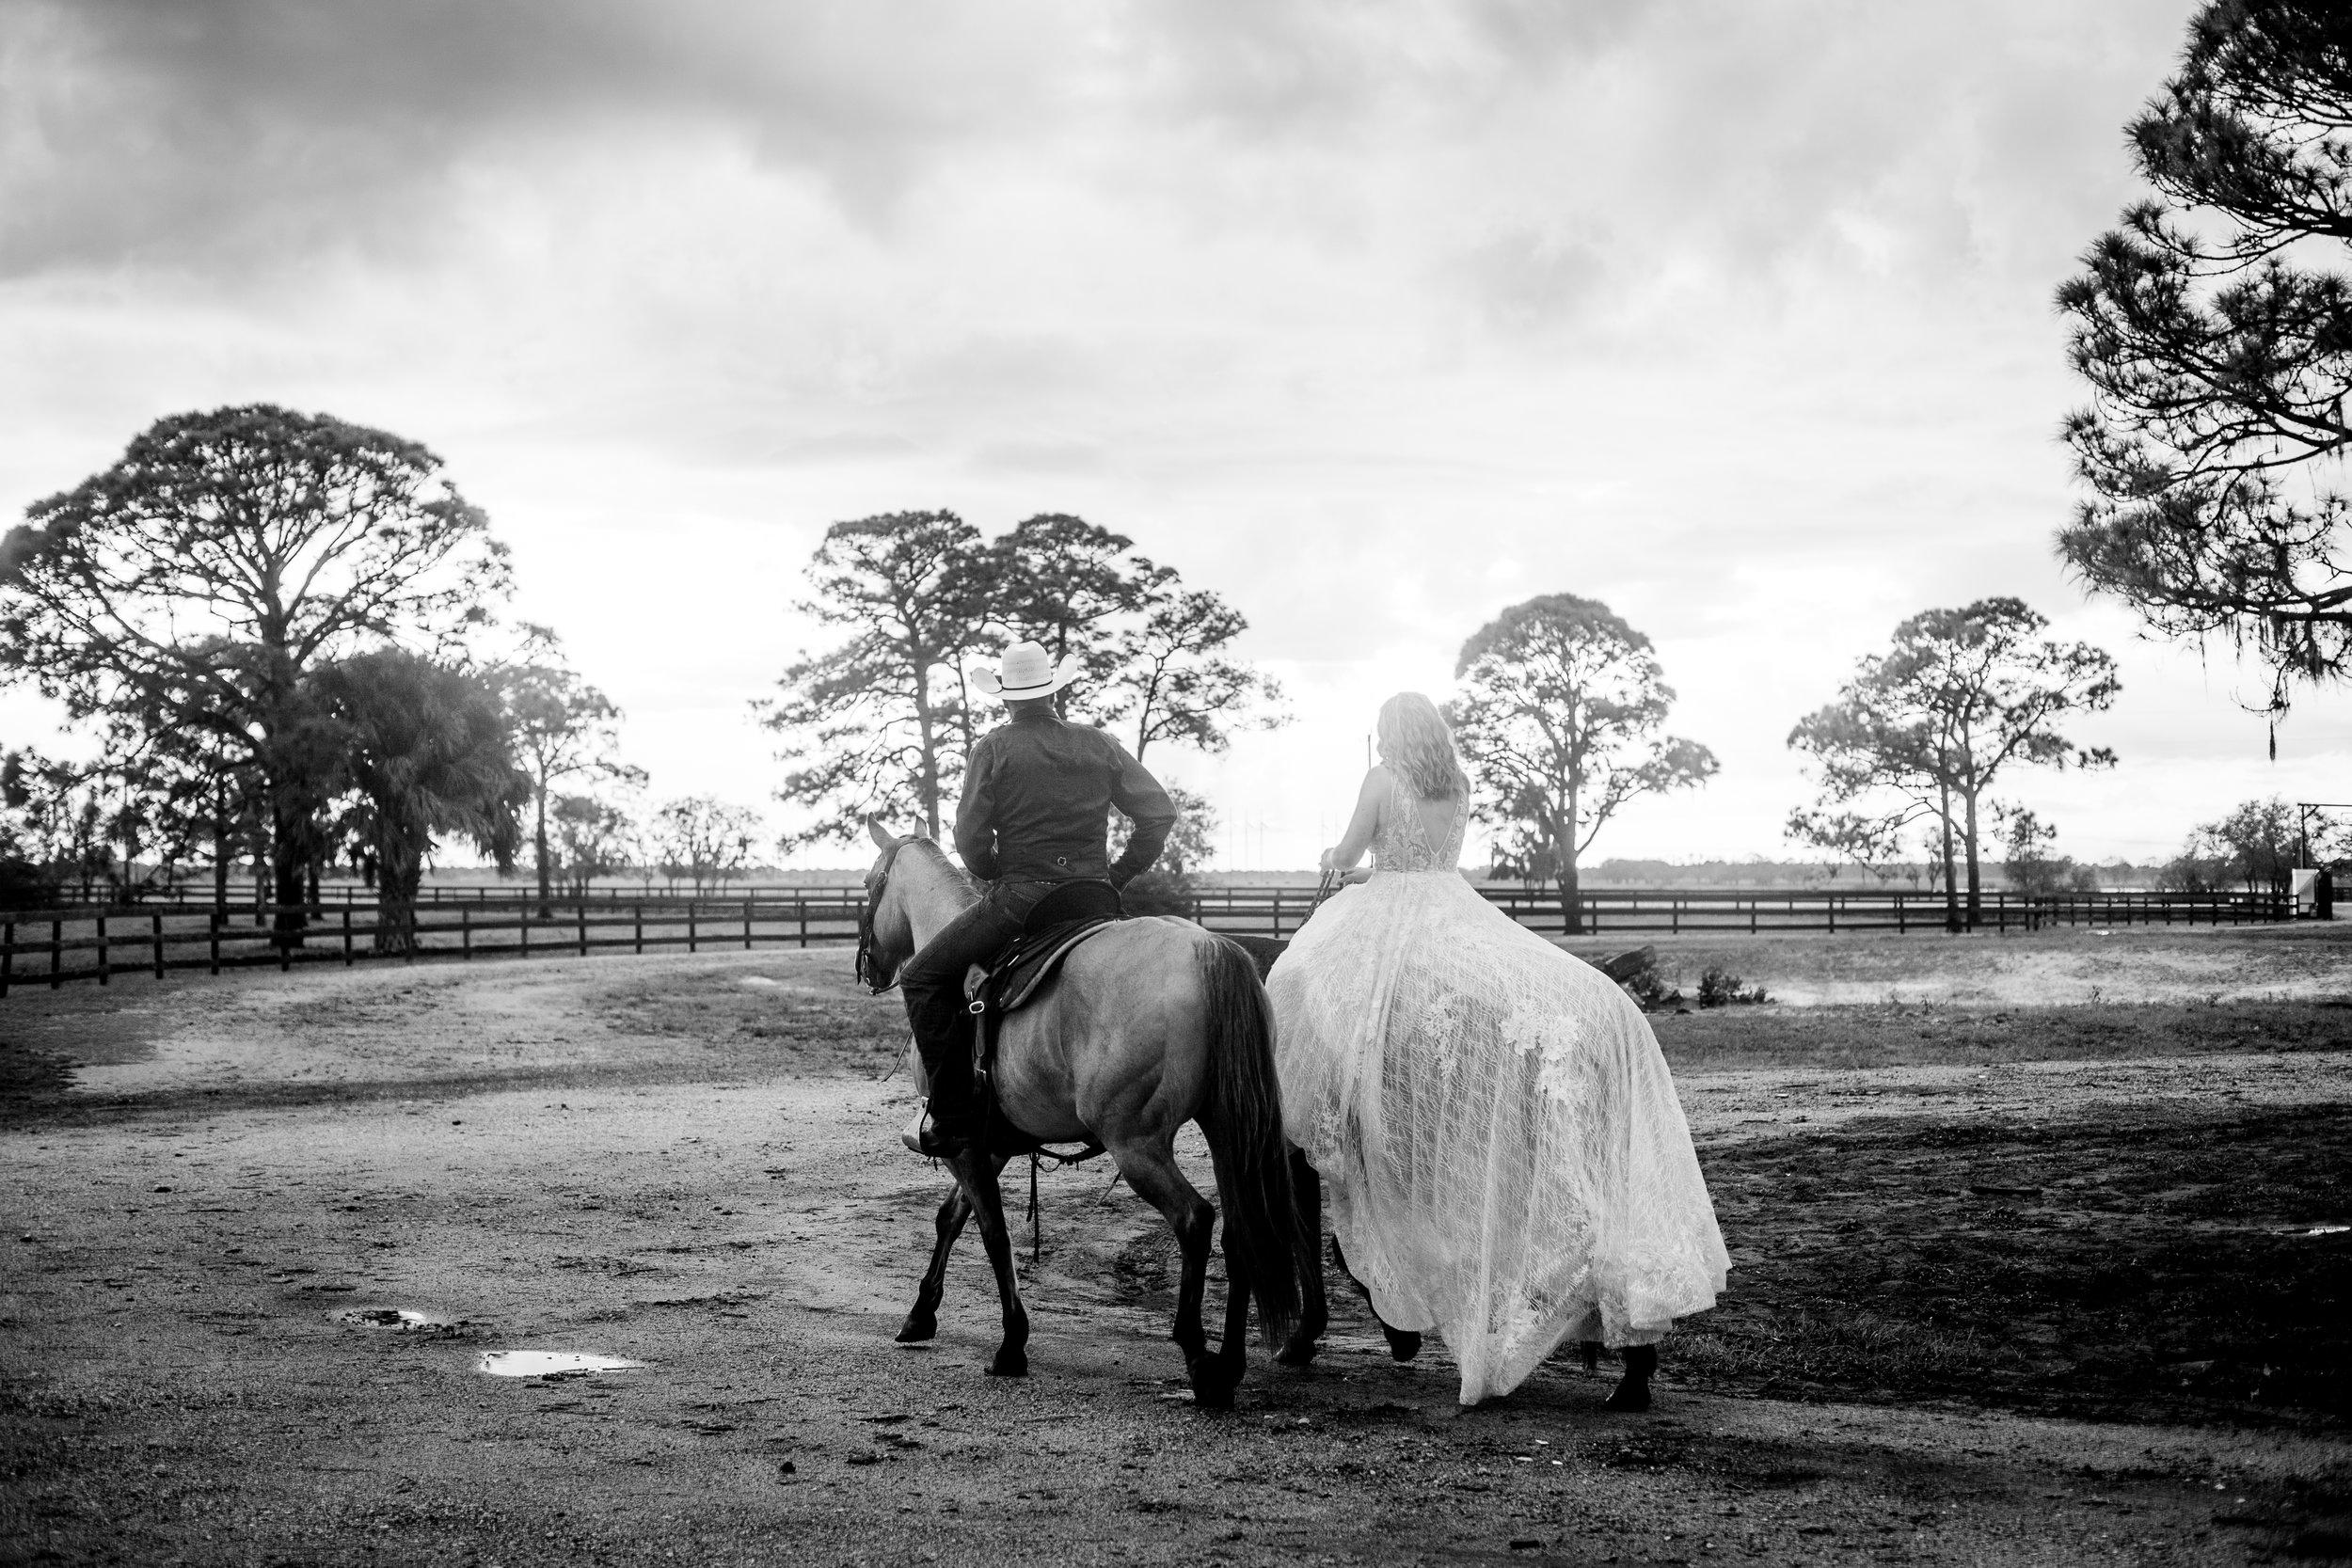 kelilina photography and films florida wedding photography videography 017-5.jpg